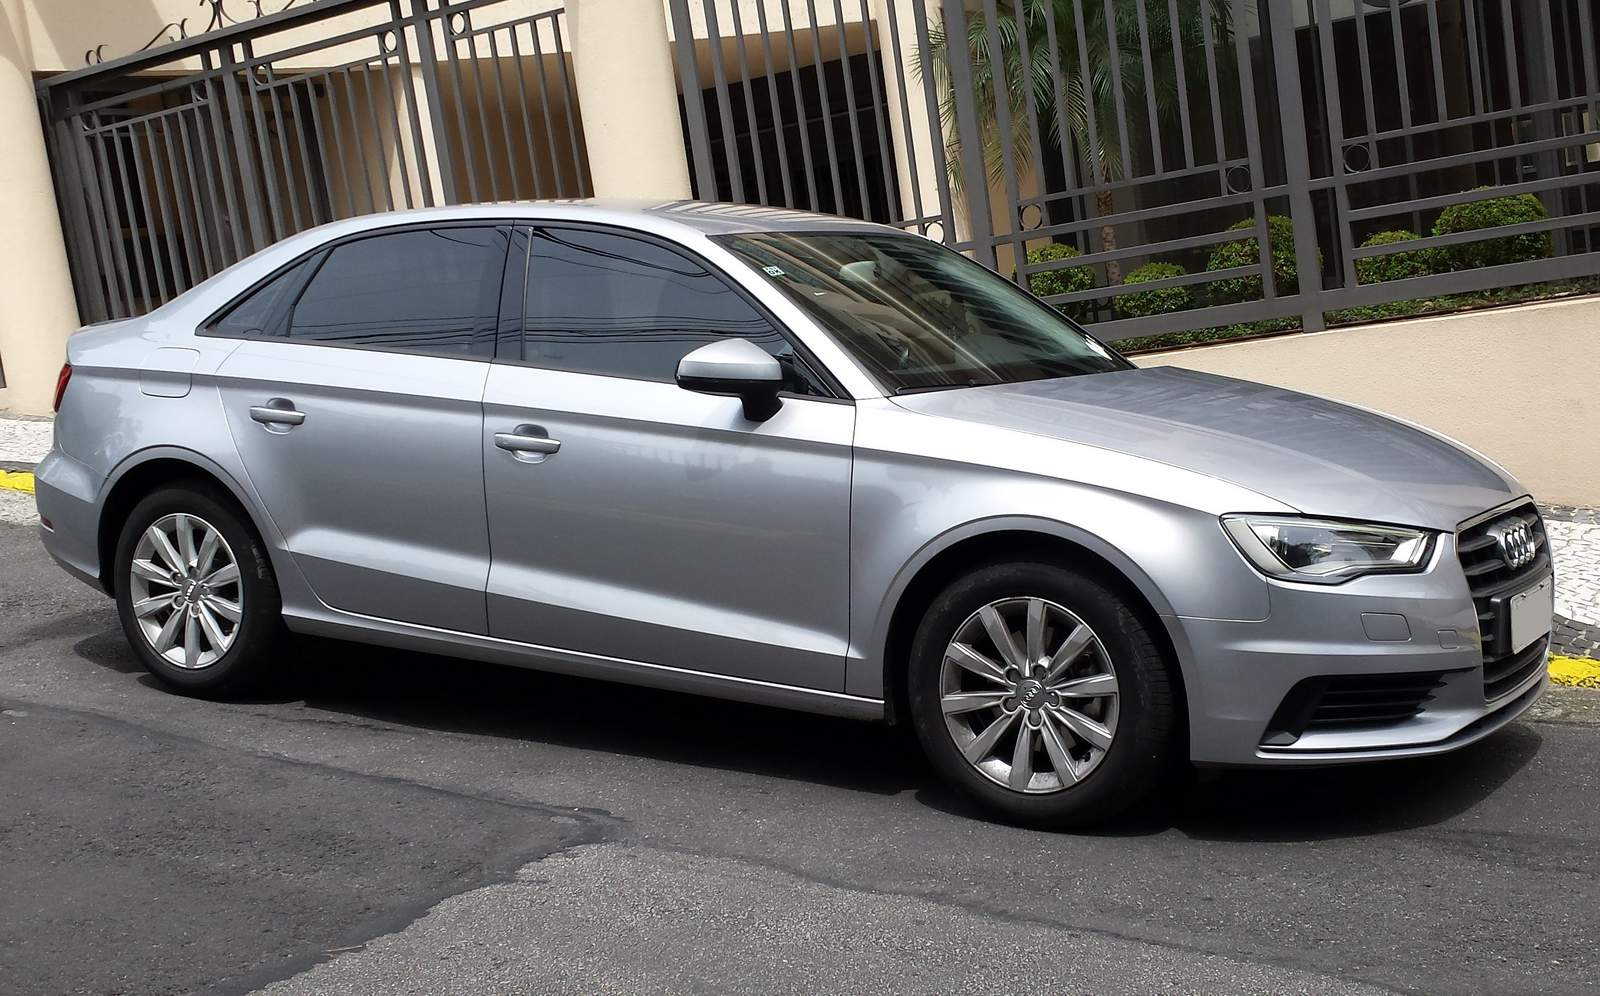 Audi A3: Linhas limpas na lateral